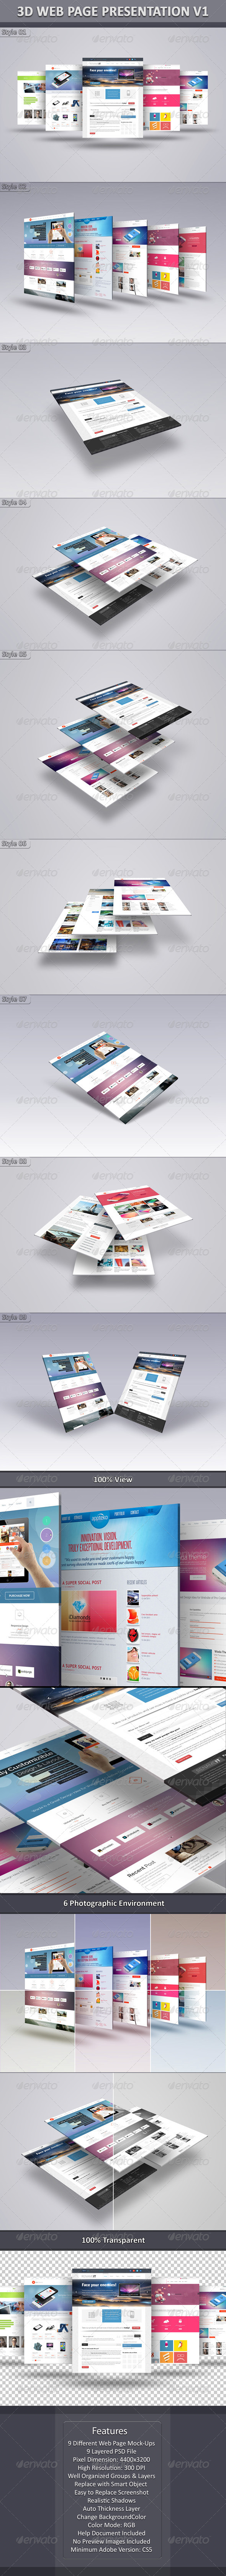 3D Web Page Presentation V1 - Graphics